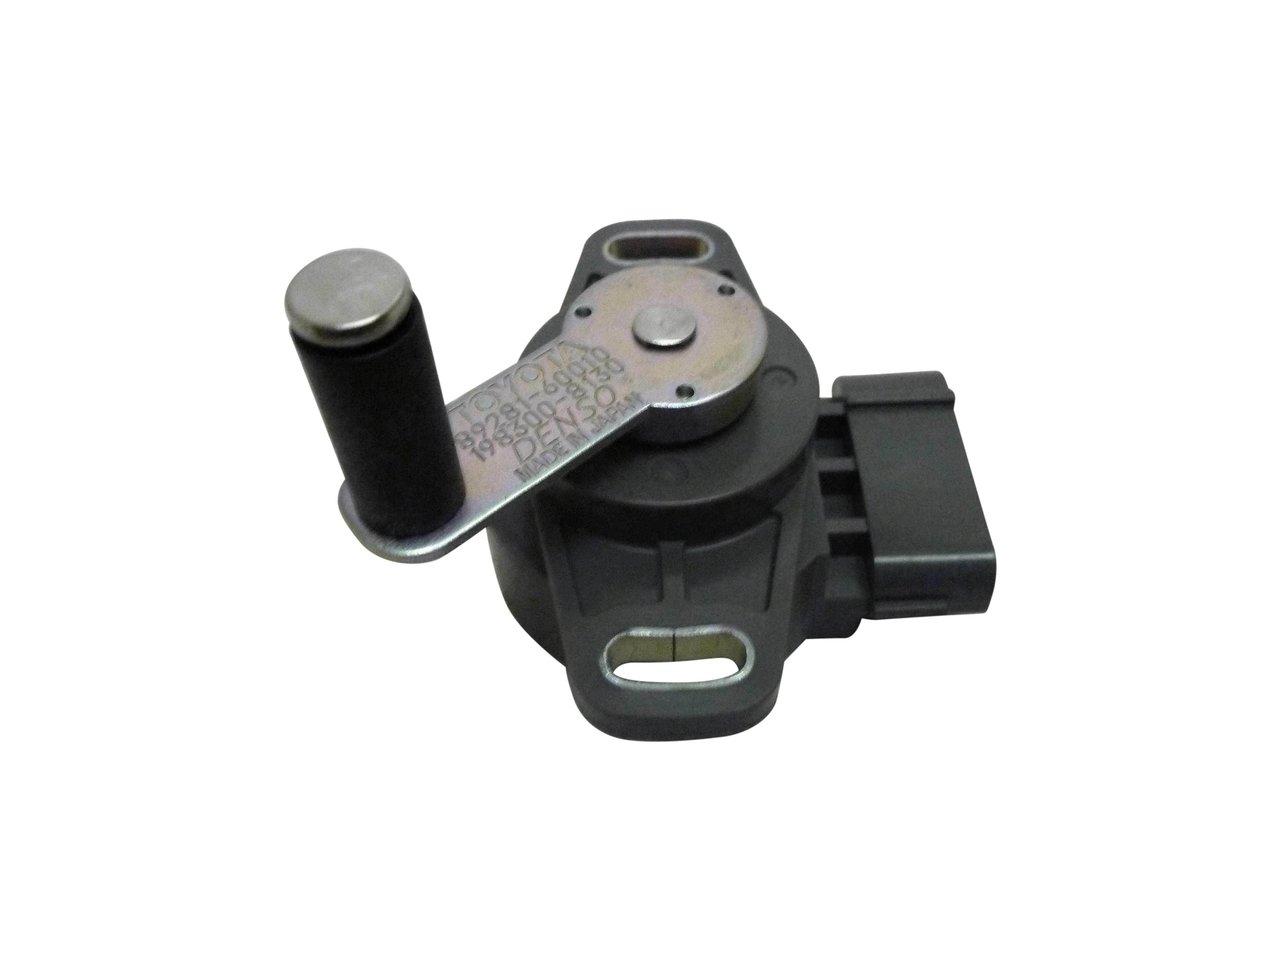 Throttle Position Sensor Cost >> Accelerator Pedal Position Sensor suitable for Landcruiser ...